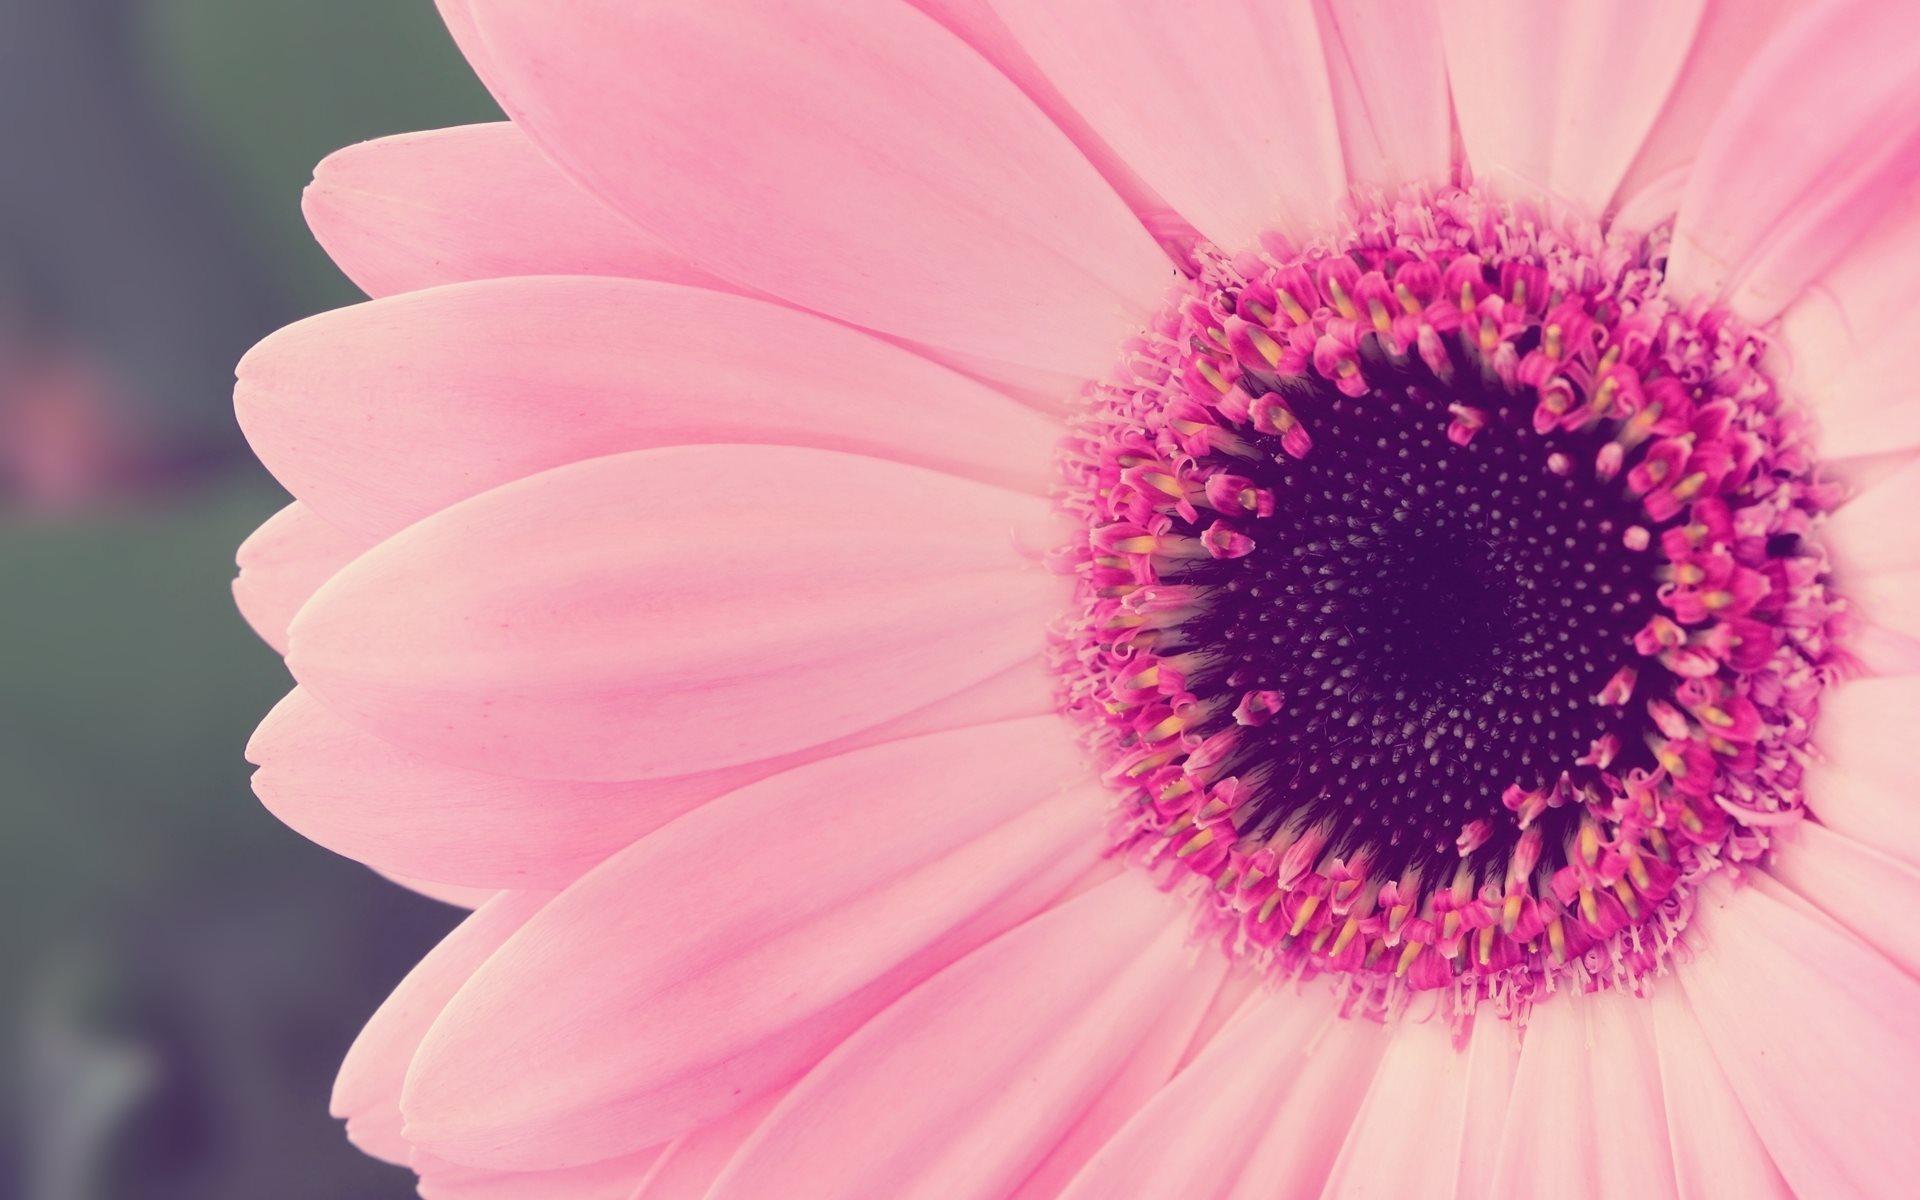 Pure Pink Flower Beauty 1920 X 1200 340x220